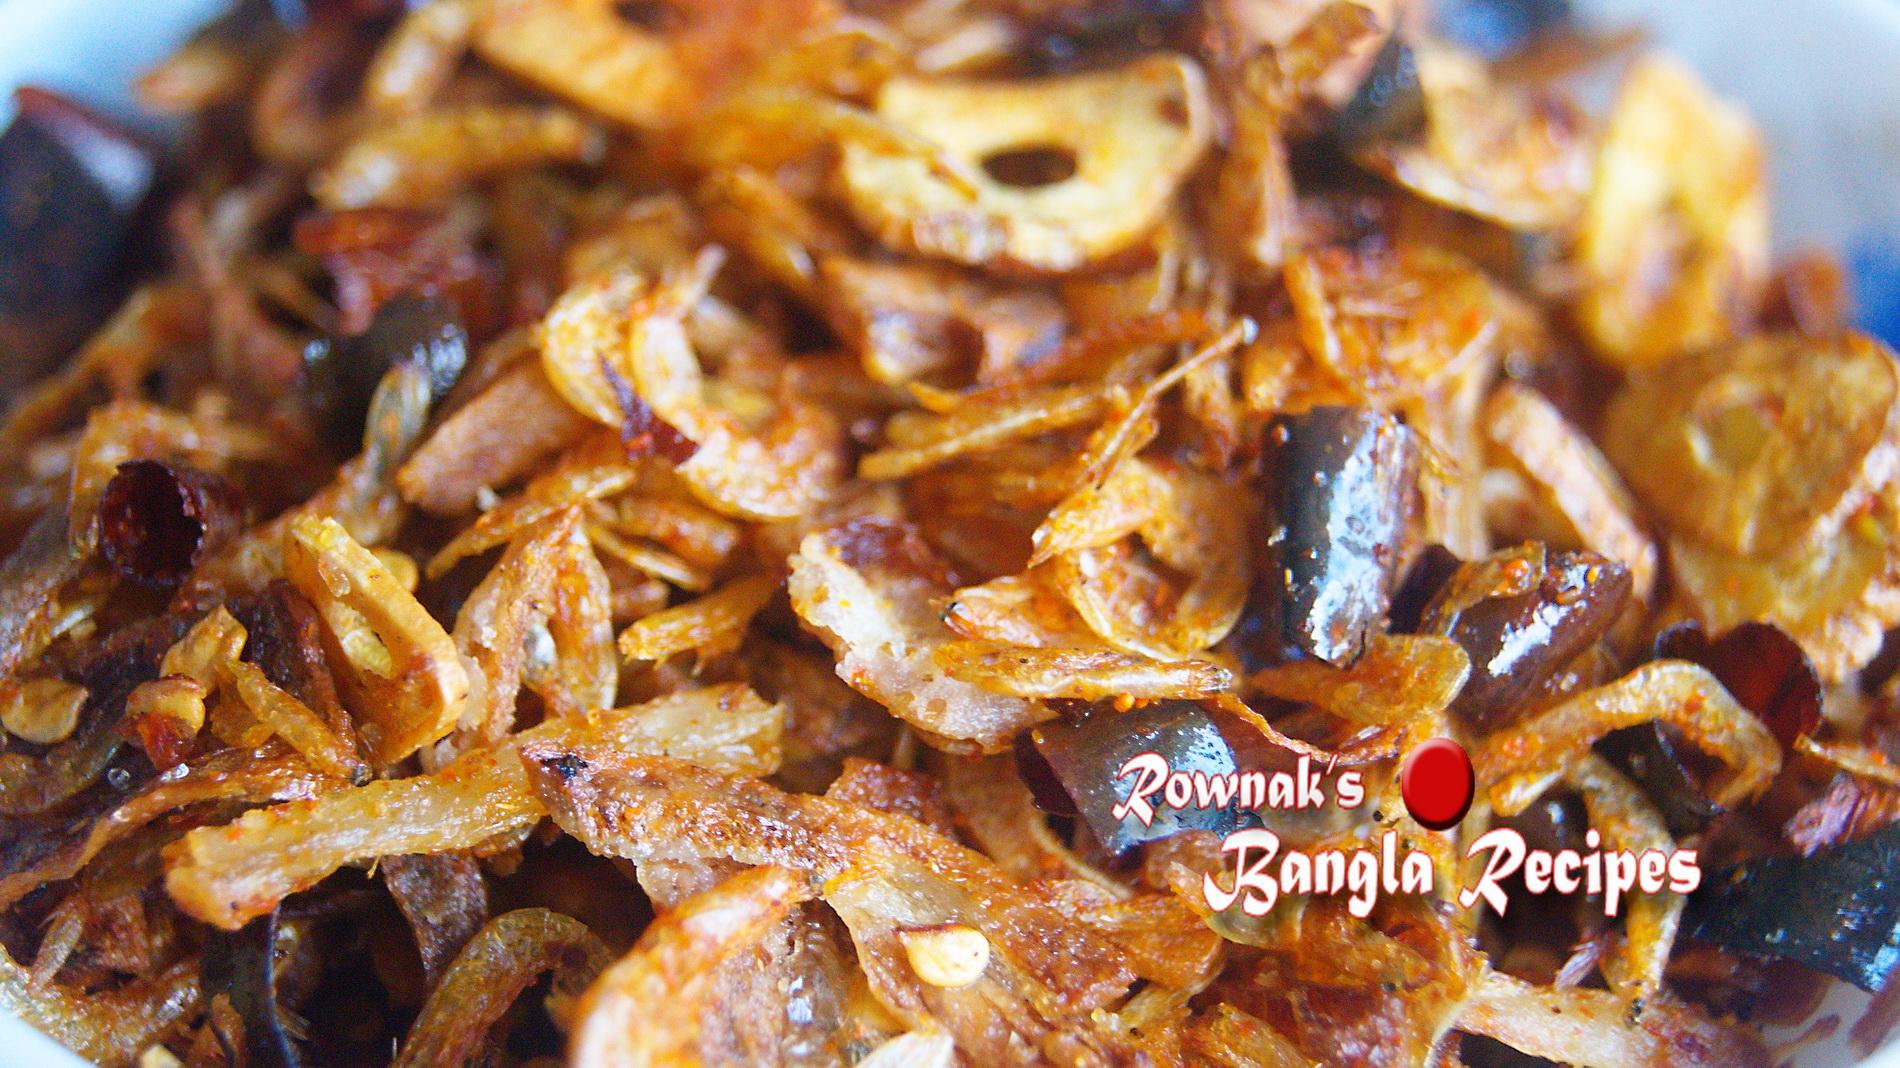 balachaung 1 Dry Balachaung